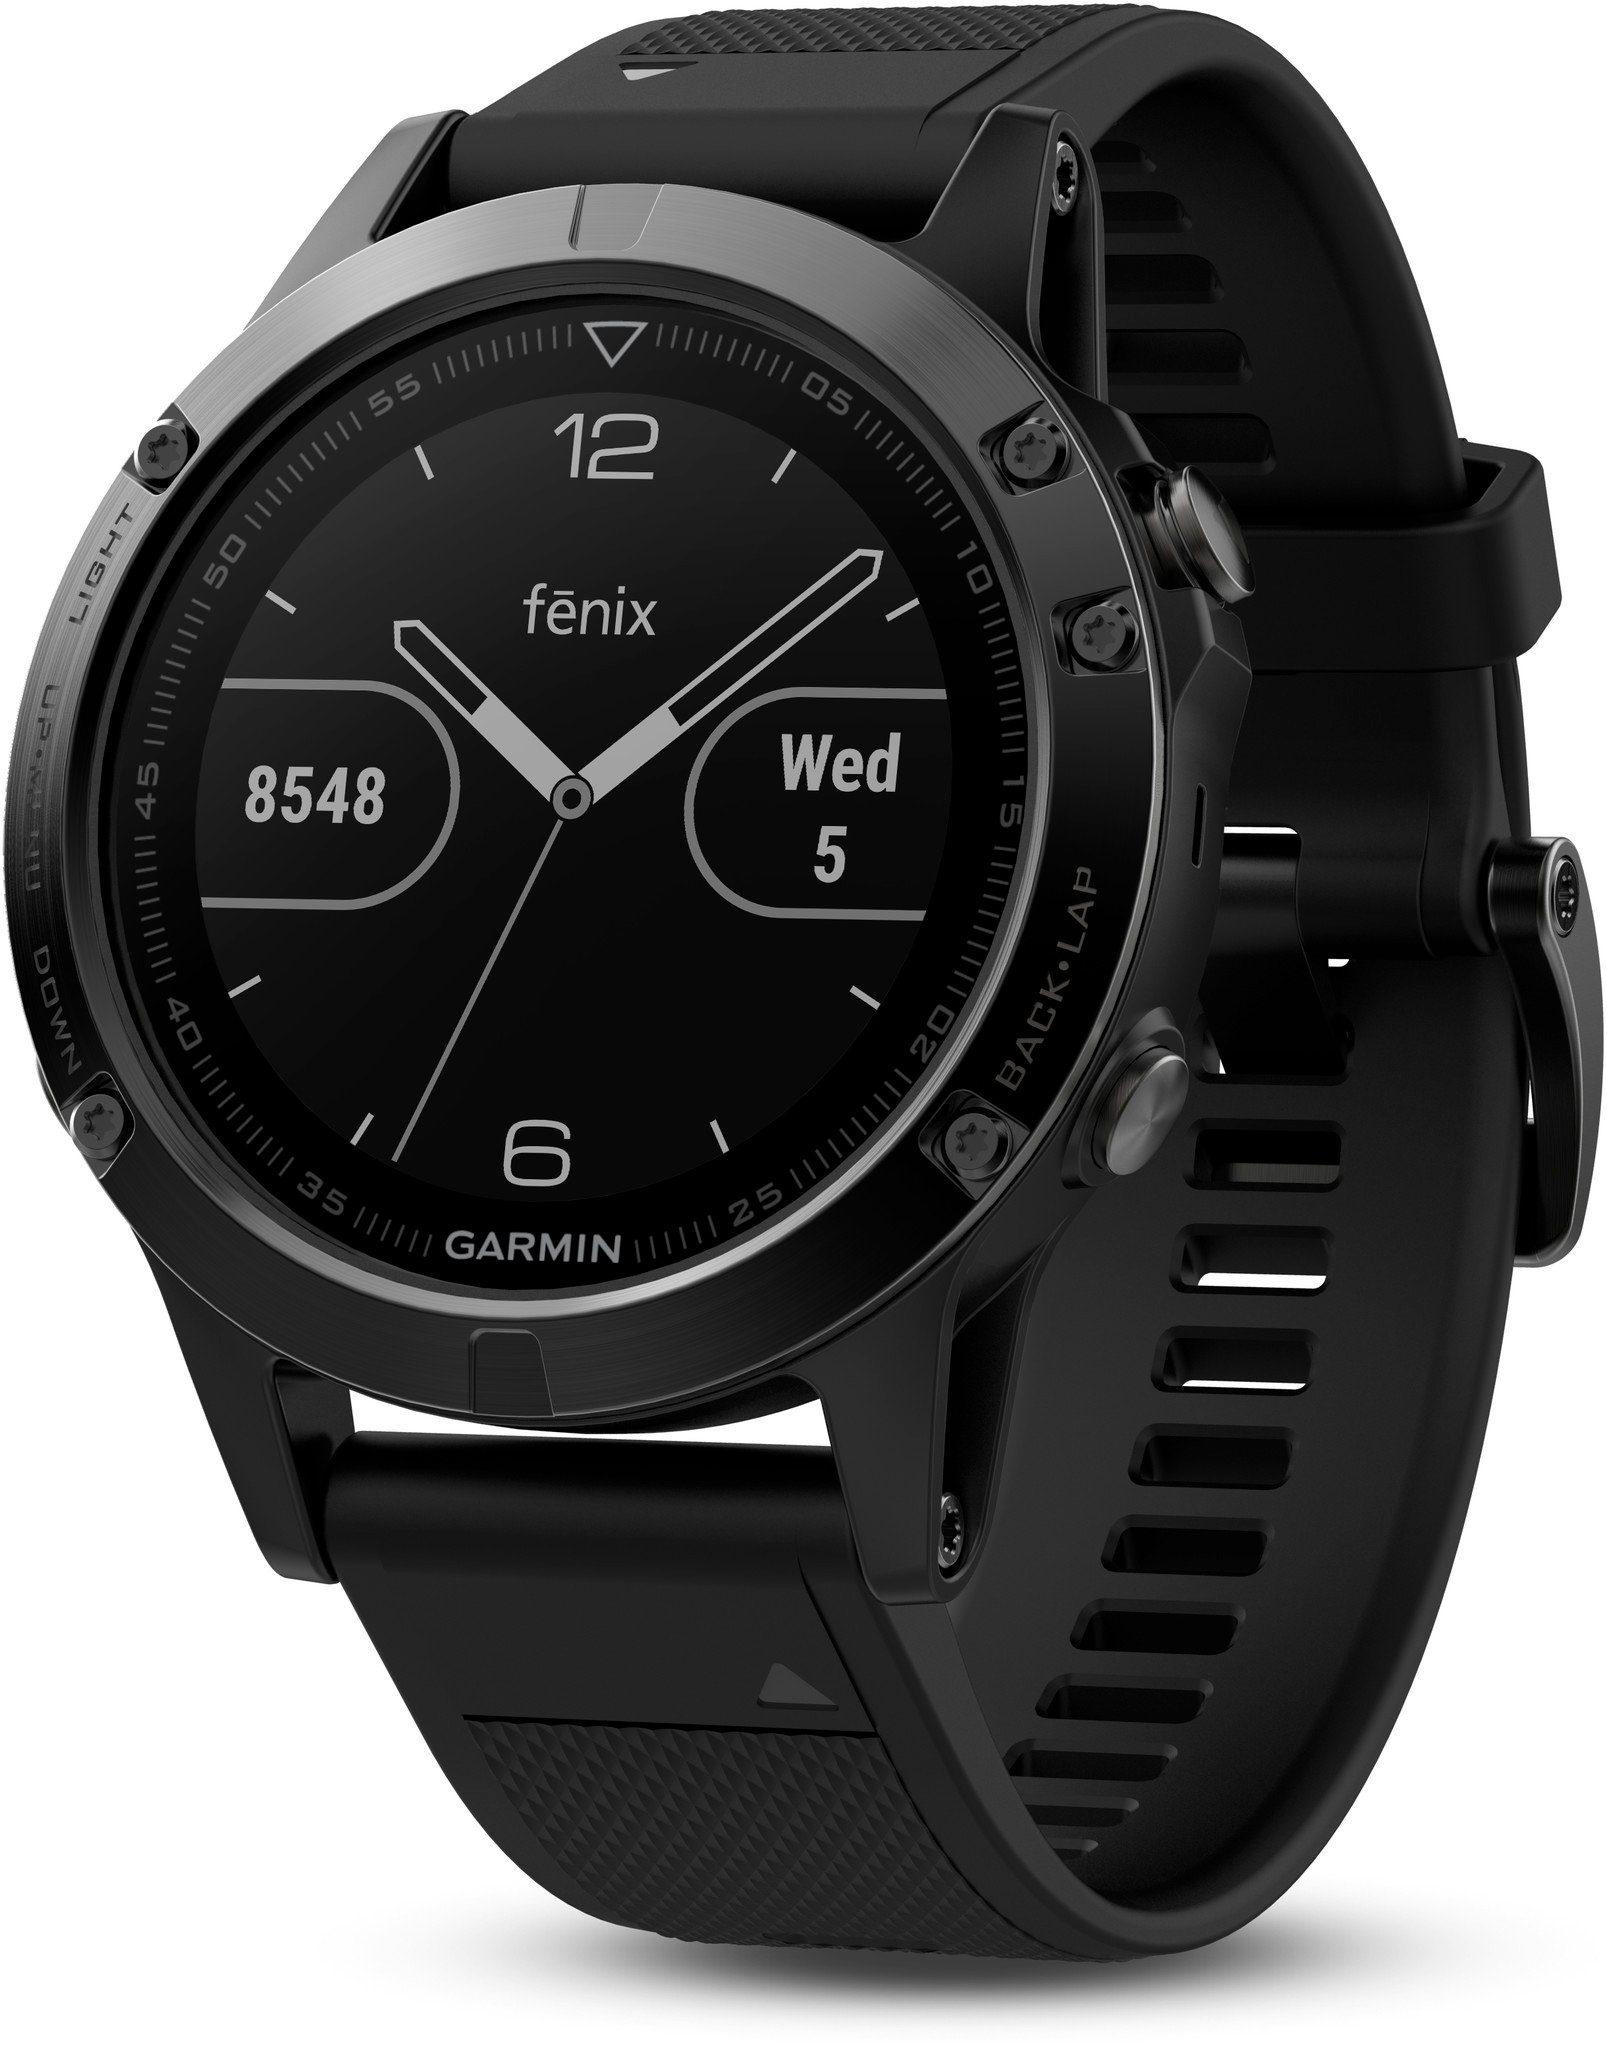 Garmin Sportuhr »fenix 5 GPS Multisportuhr mit schwarzem Armband«